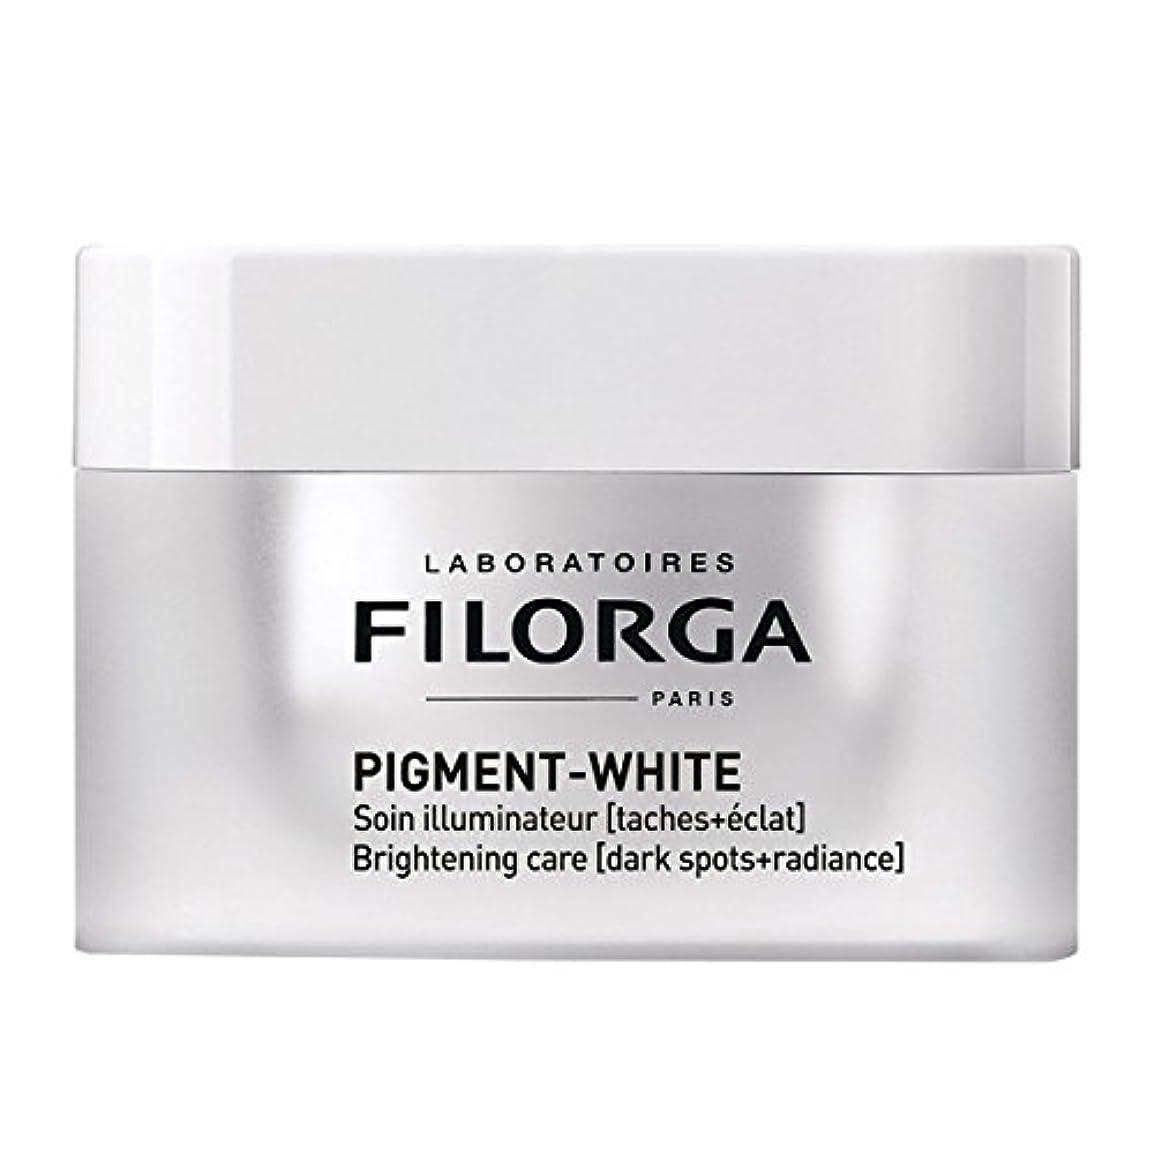 帝国主義十億動員するFilorga Pigment-white 50ml [並行輸入品]